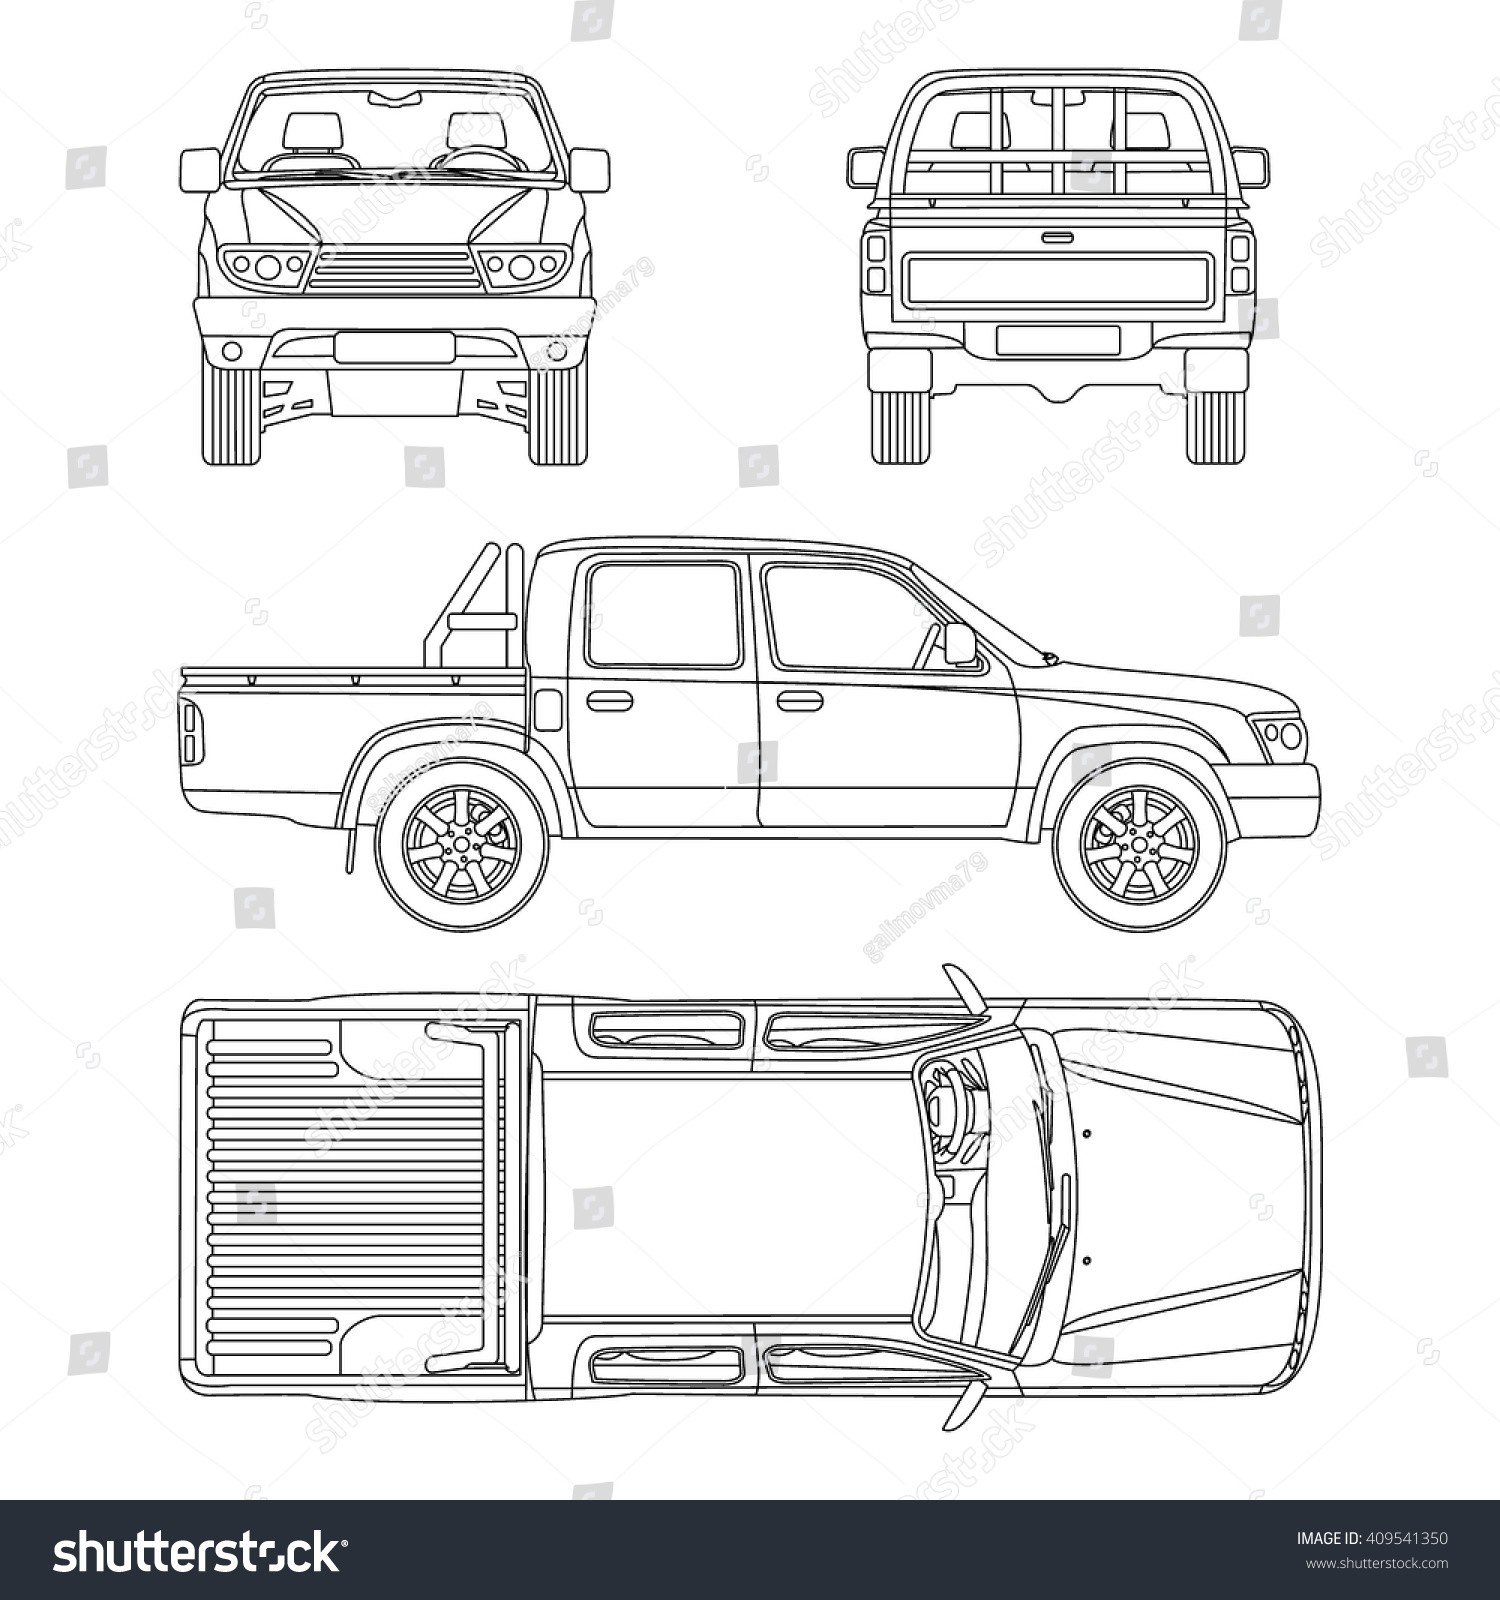 Car Inspection Diagram